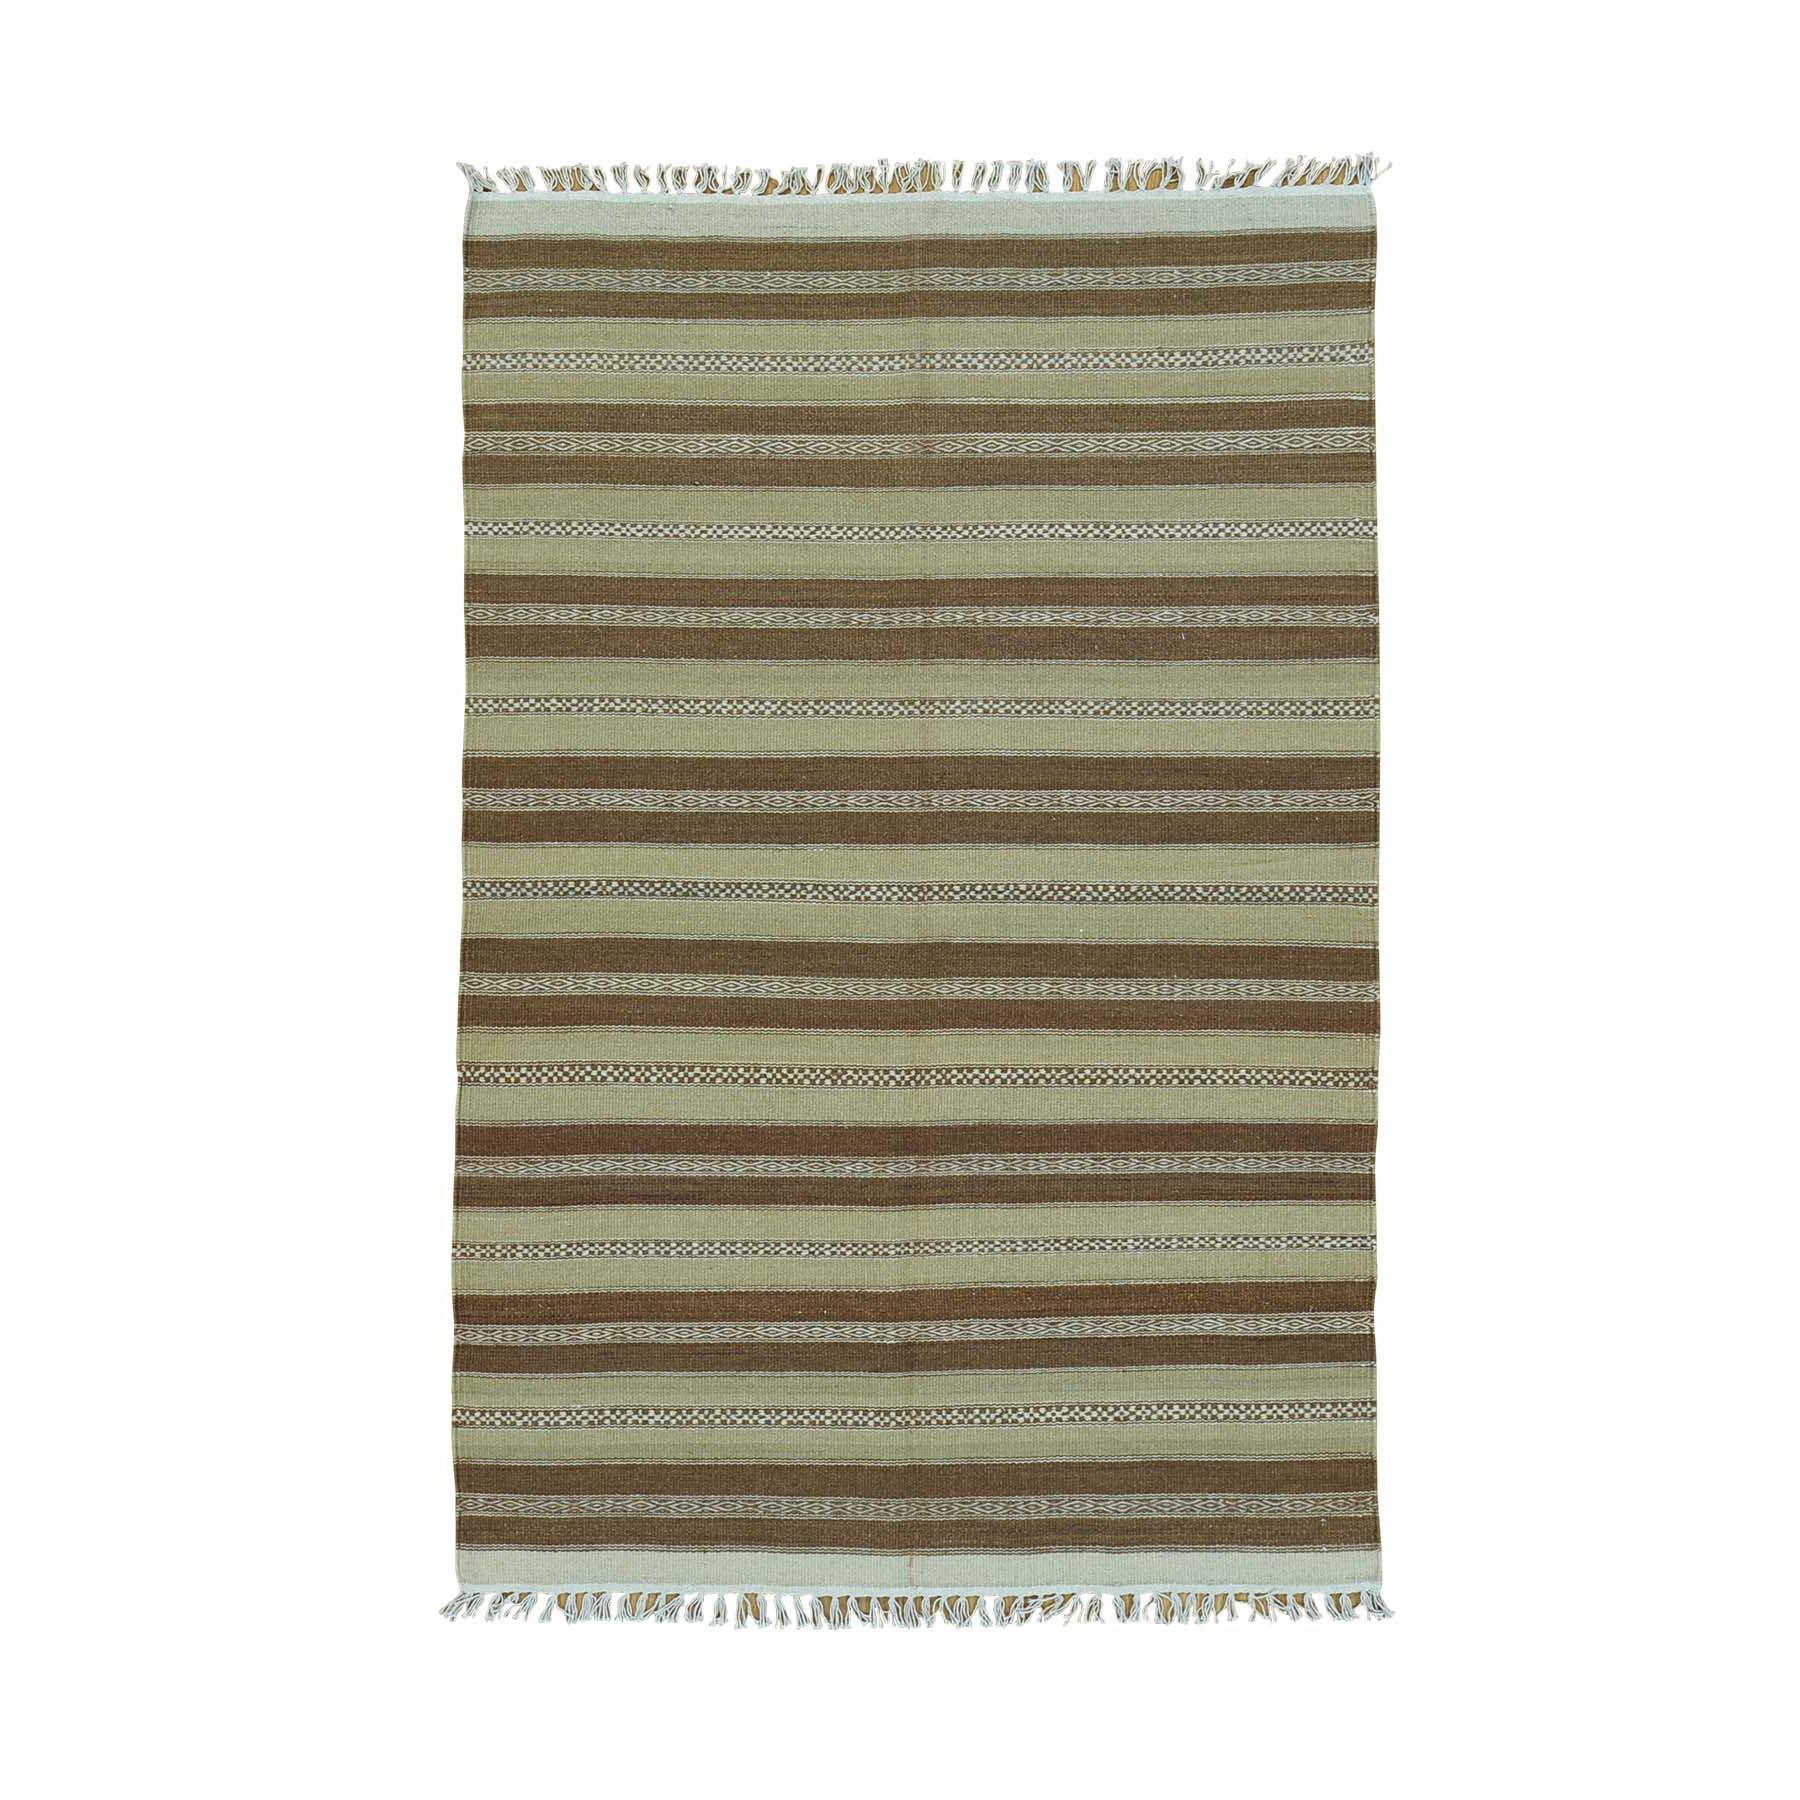 "3'10""X5'10"" Hand Woven Durie Kilim Flat Weave Striped Oriental Rug moac00ae"